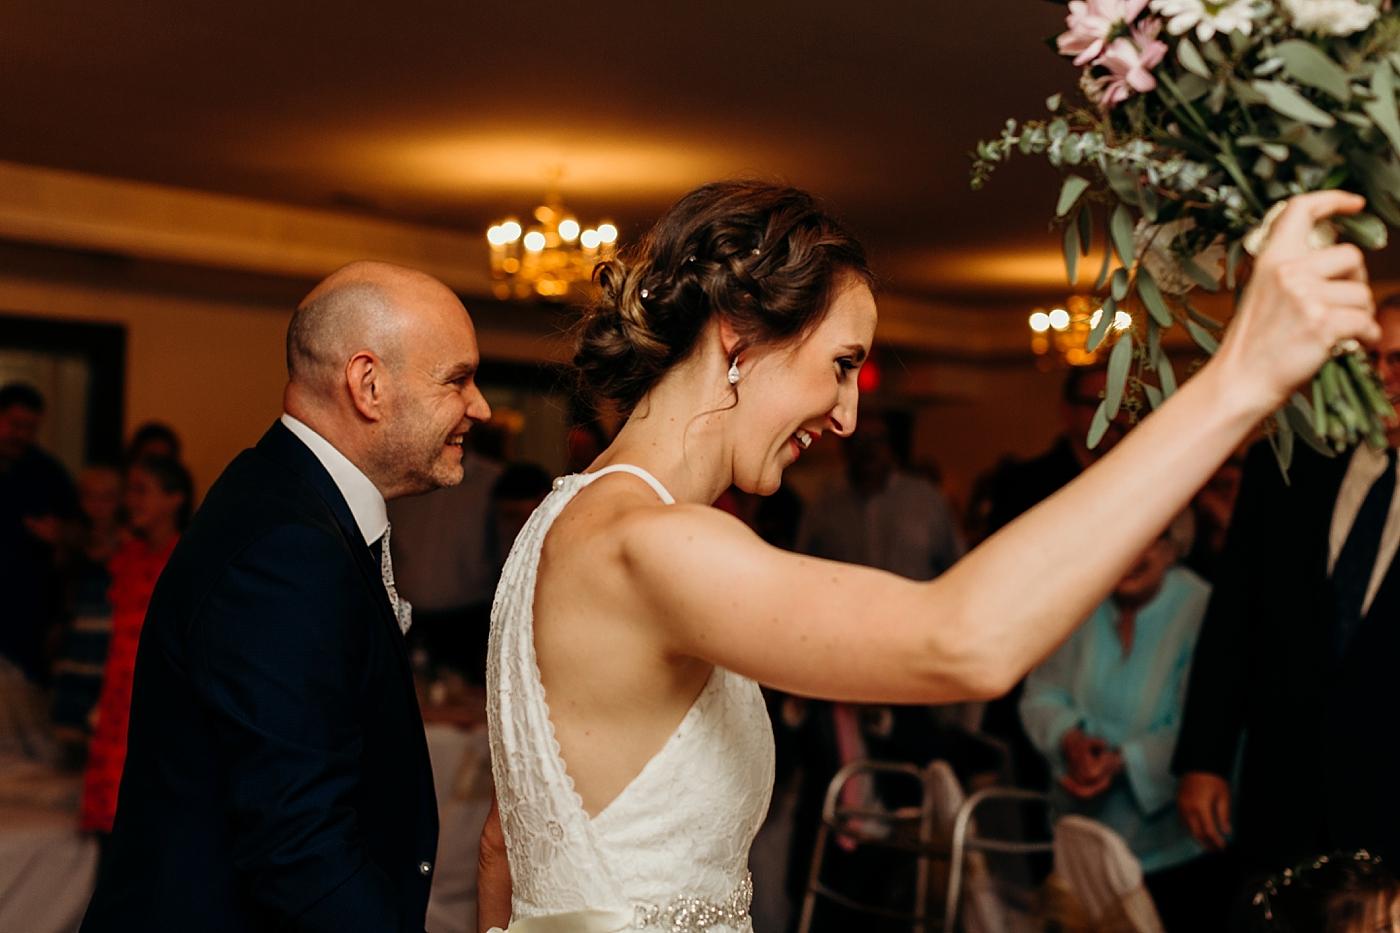 Chateau-Michelle-Wedding-Julia+JuanLuis_TheHeartlandersCo2018LA-332.jpg